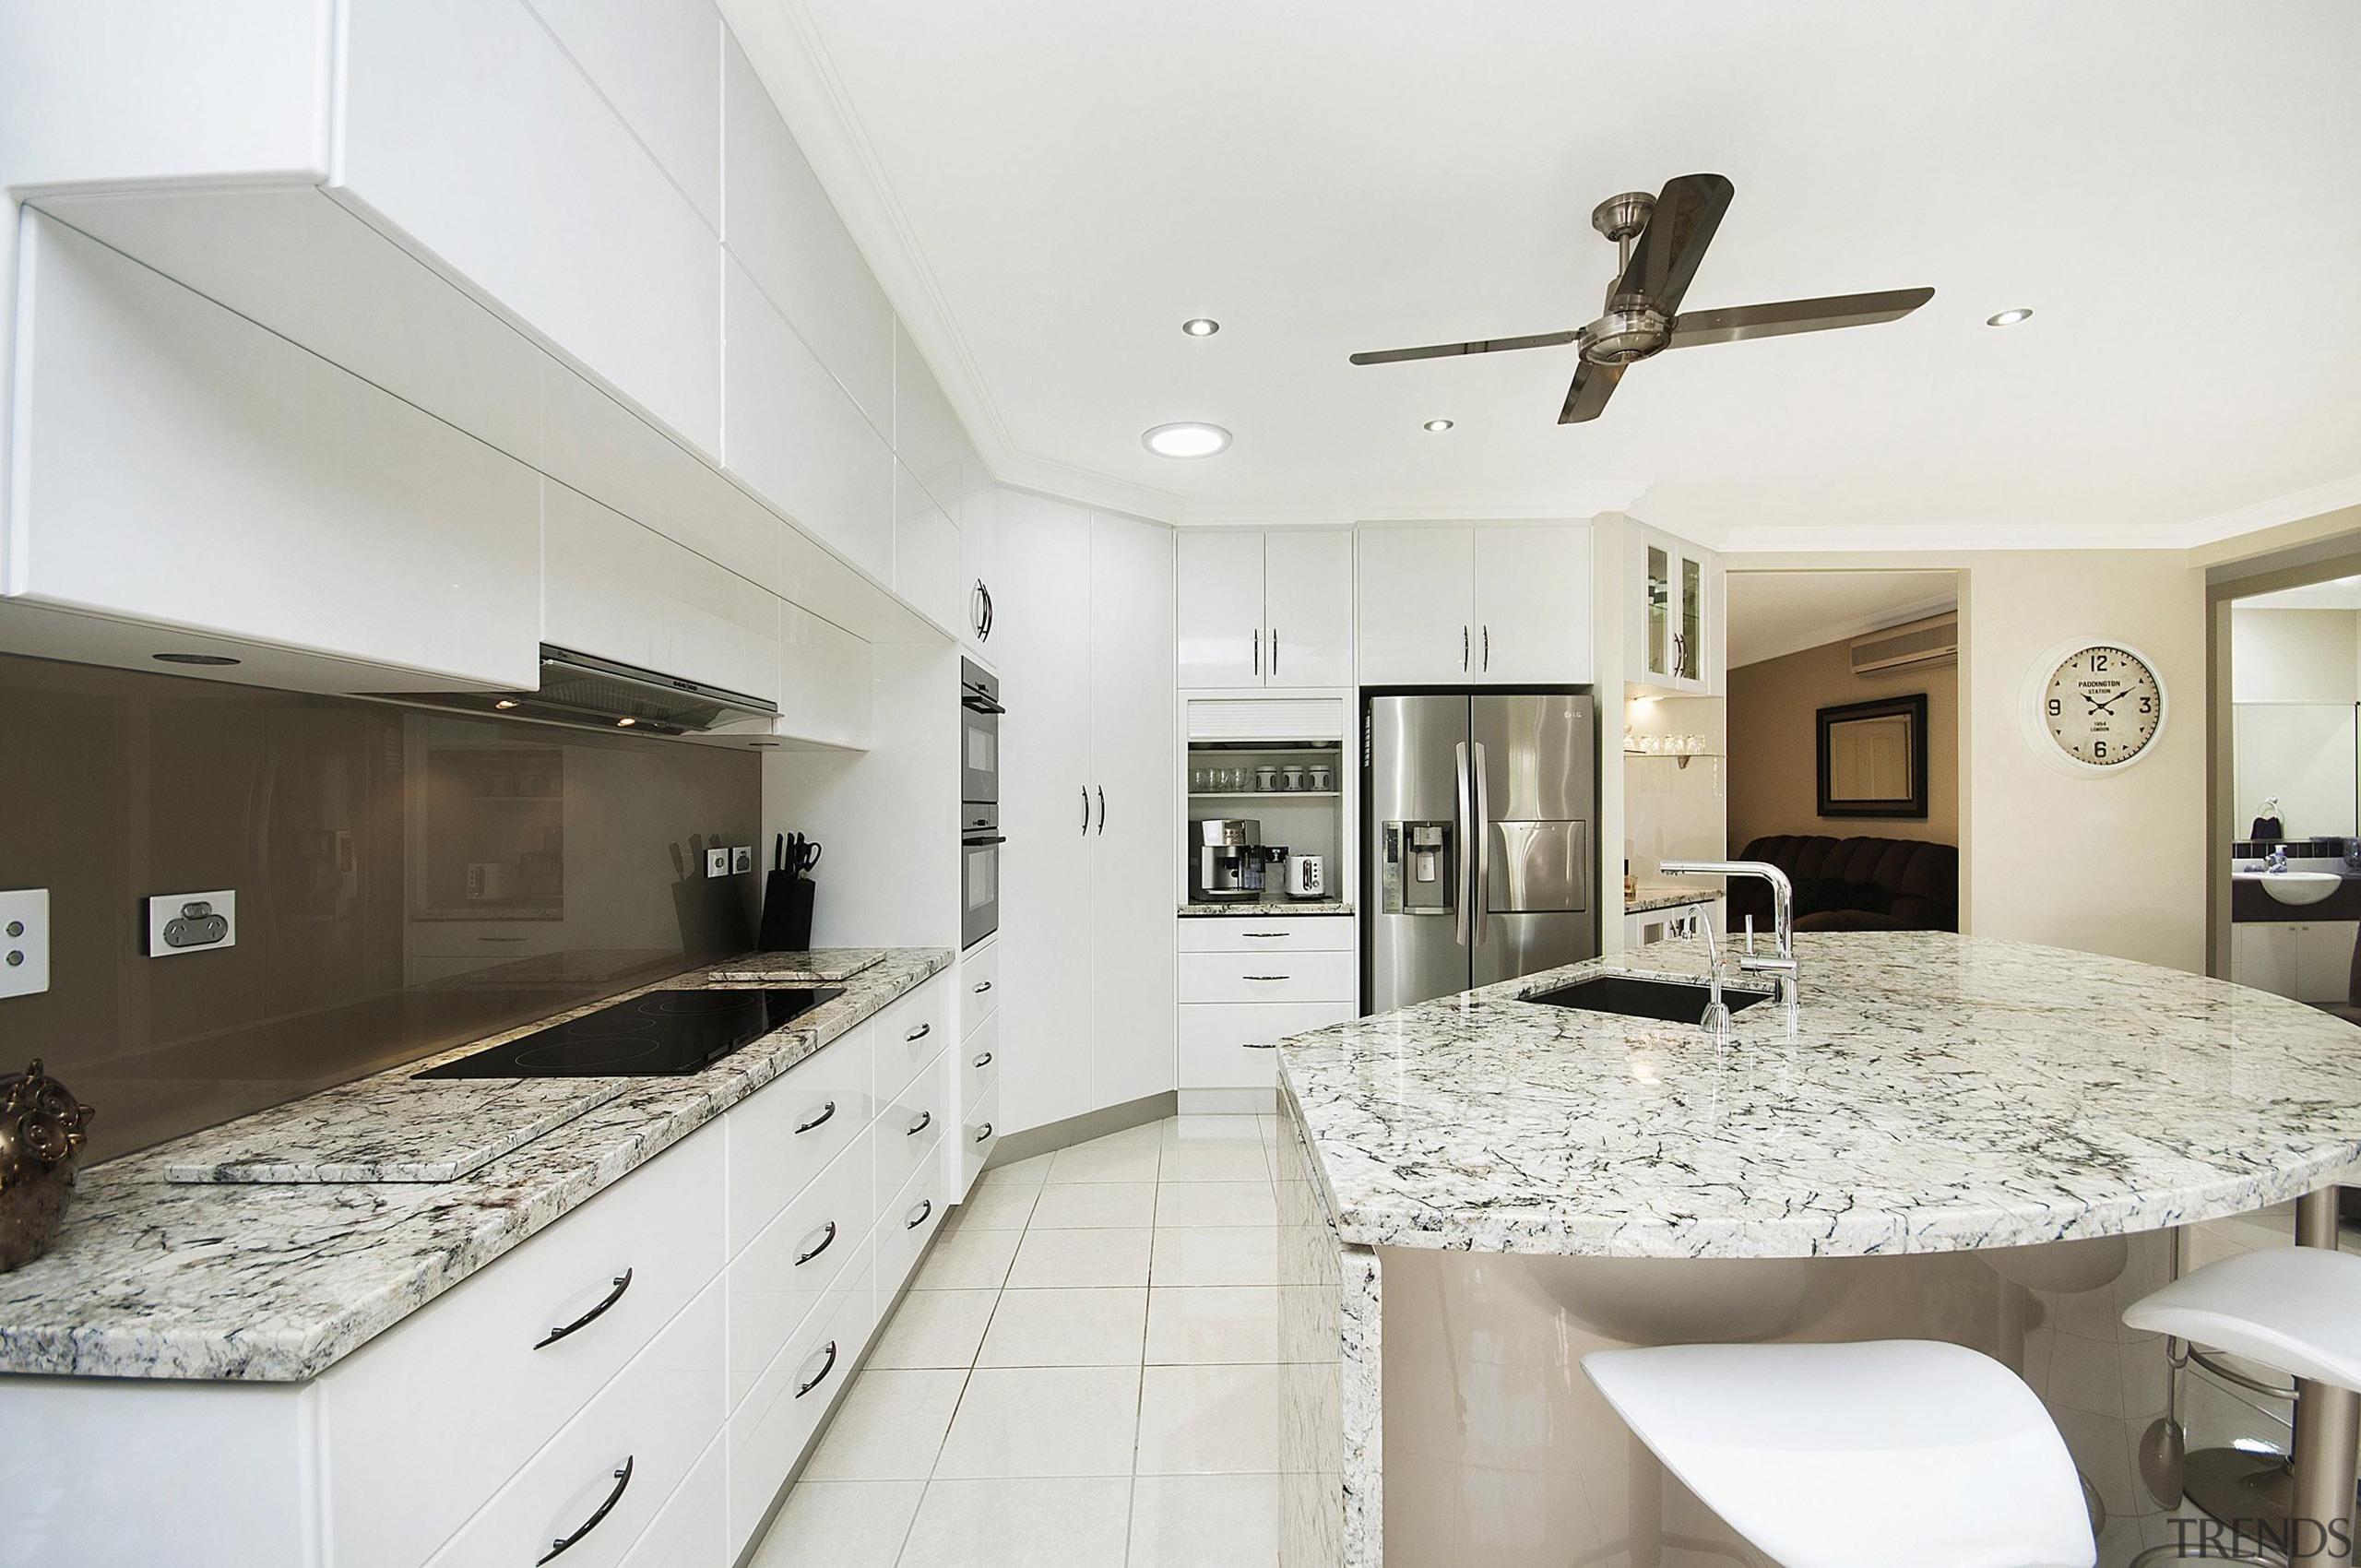 Winner Kitchen Design of the Year 2013 North countertop, estate, home, interior design, kitchen, property, real estate, room, white